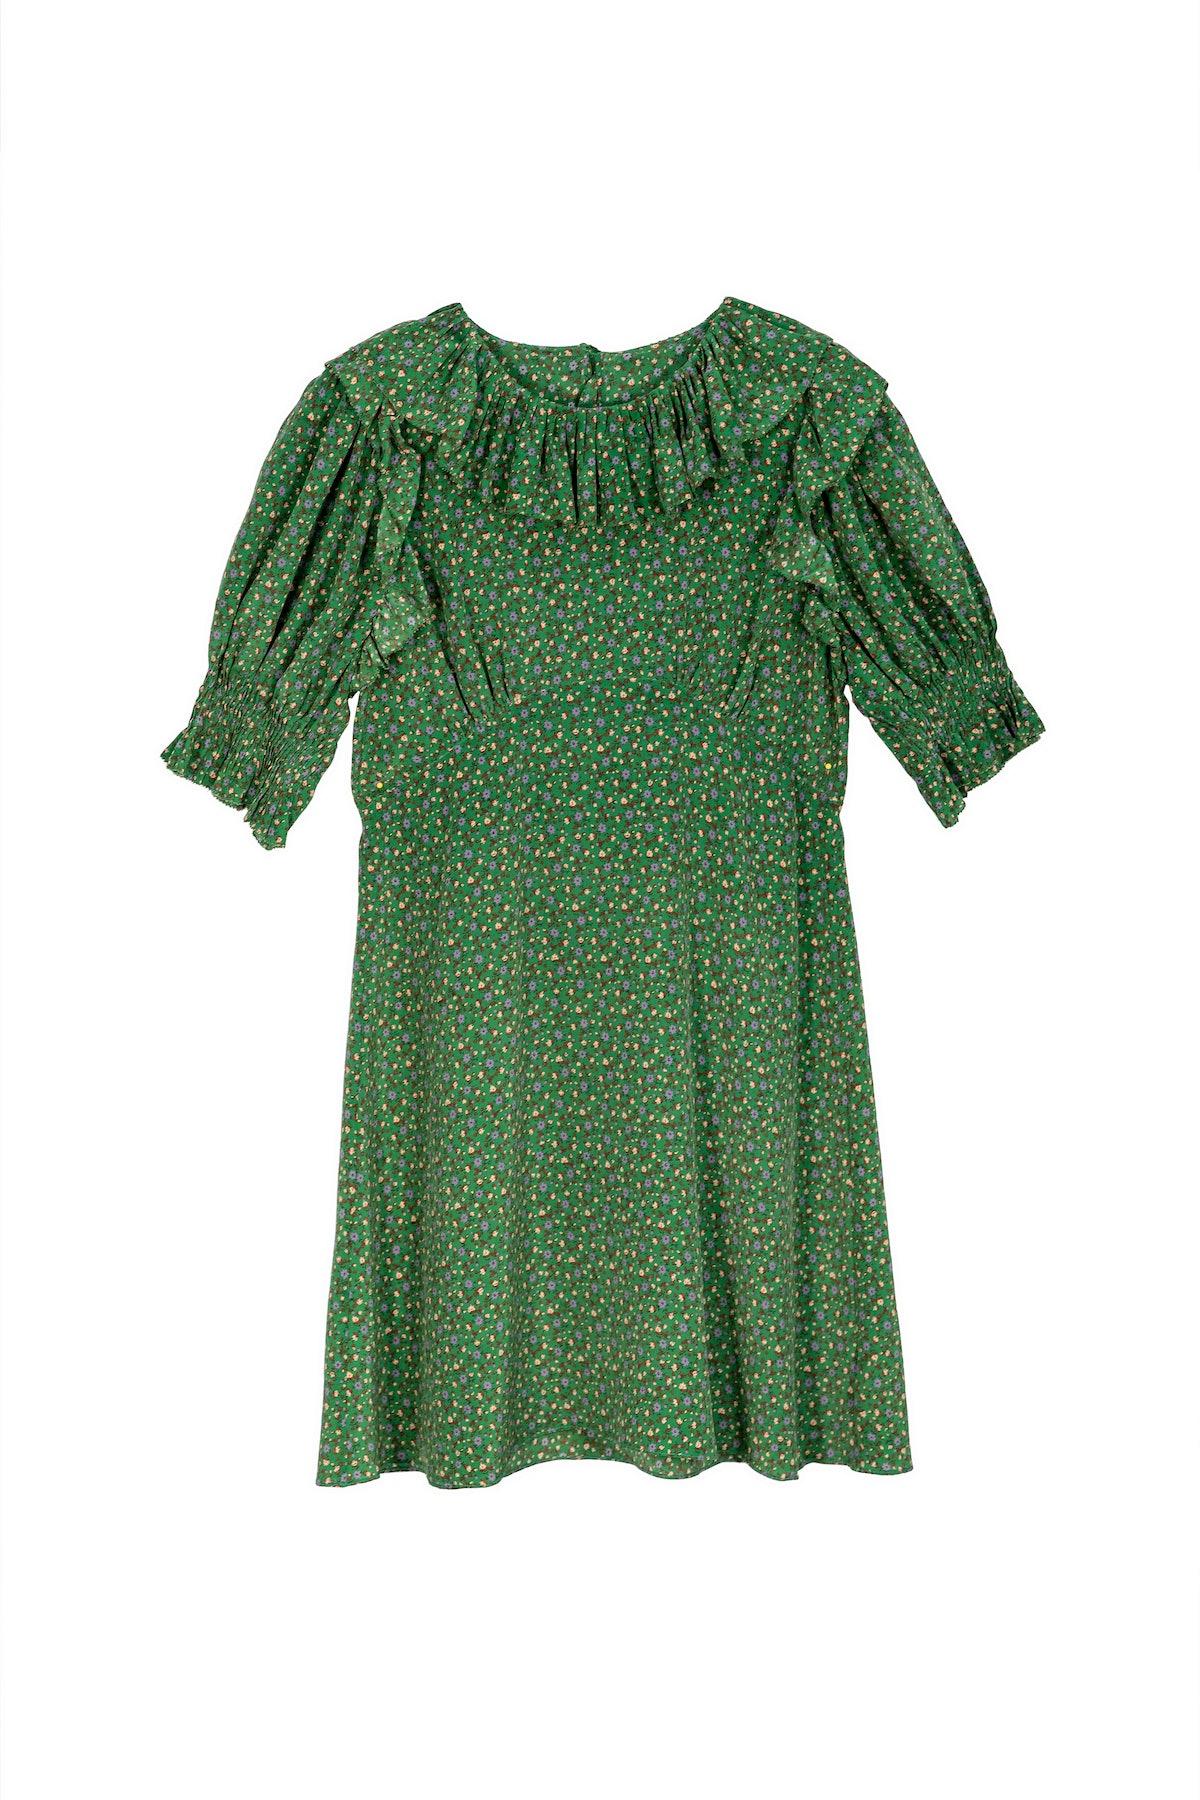 Baudoin Dress